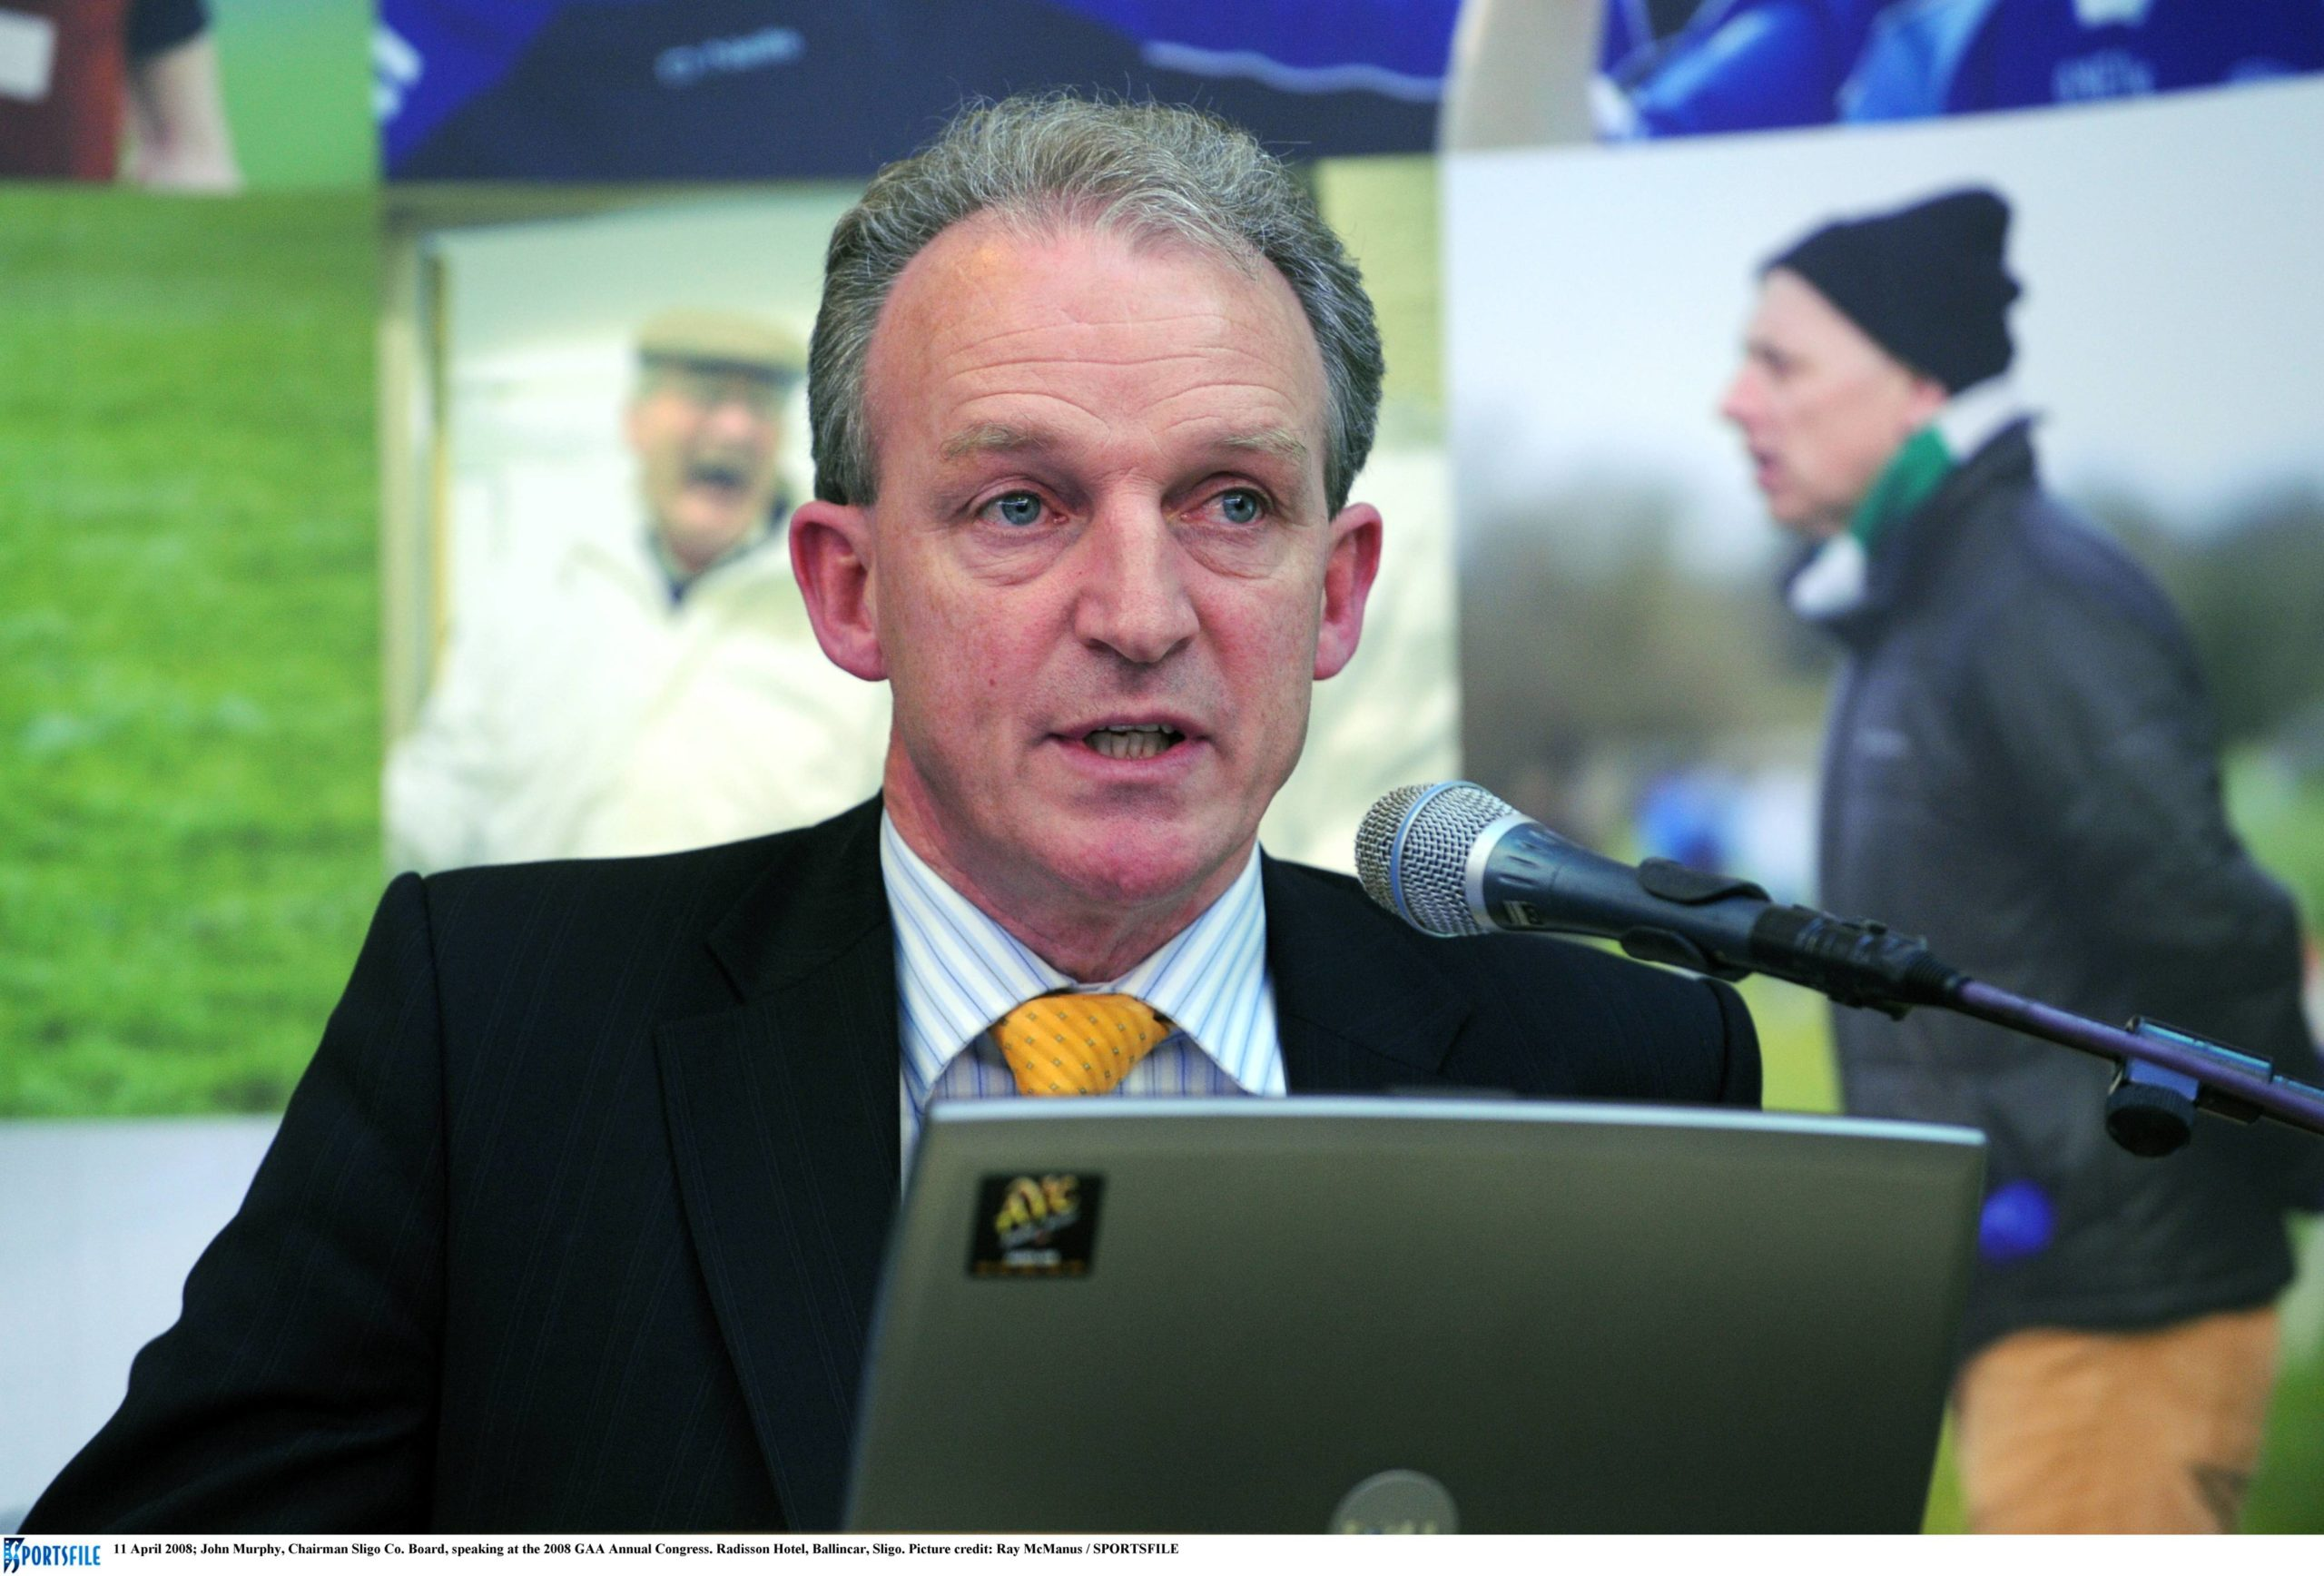 New Connacht Council President John Murphy Makes Address to 2021 Connacht GAA Convention